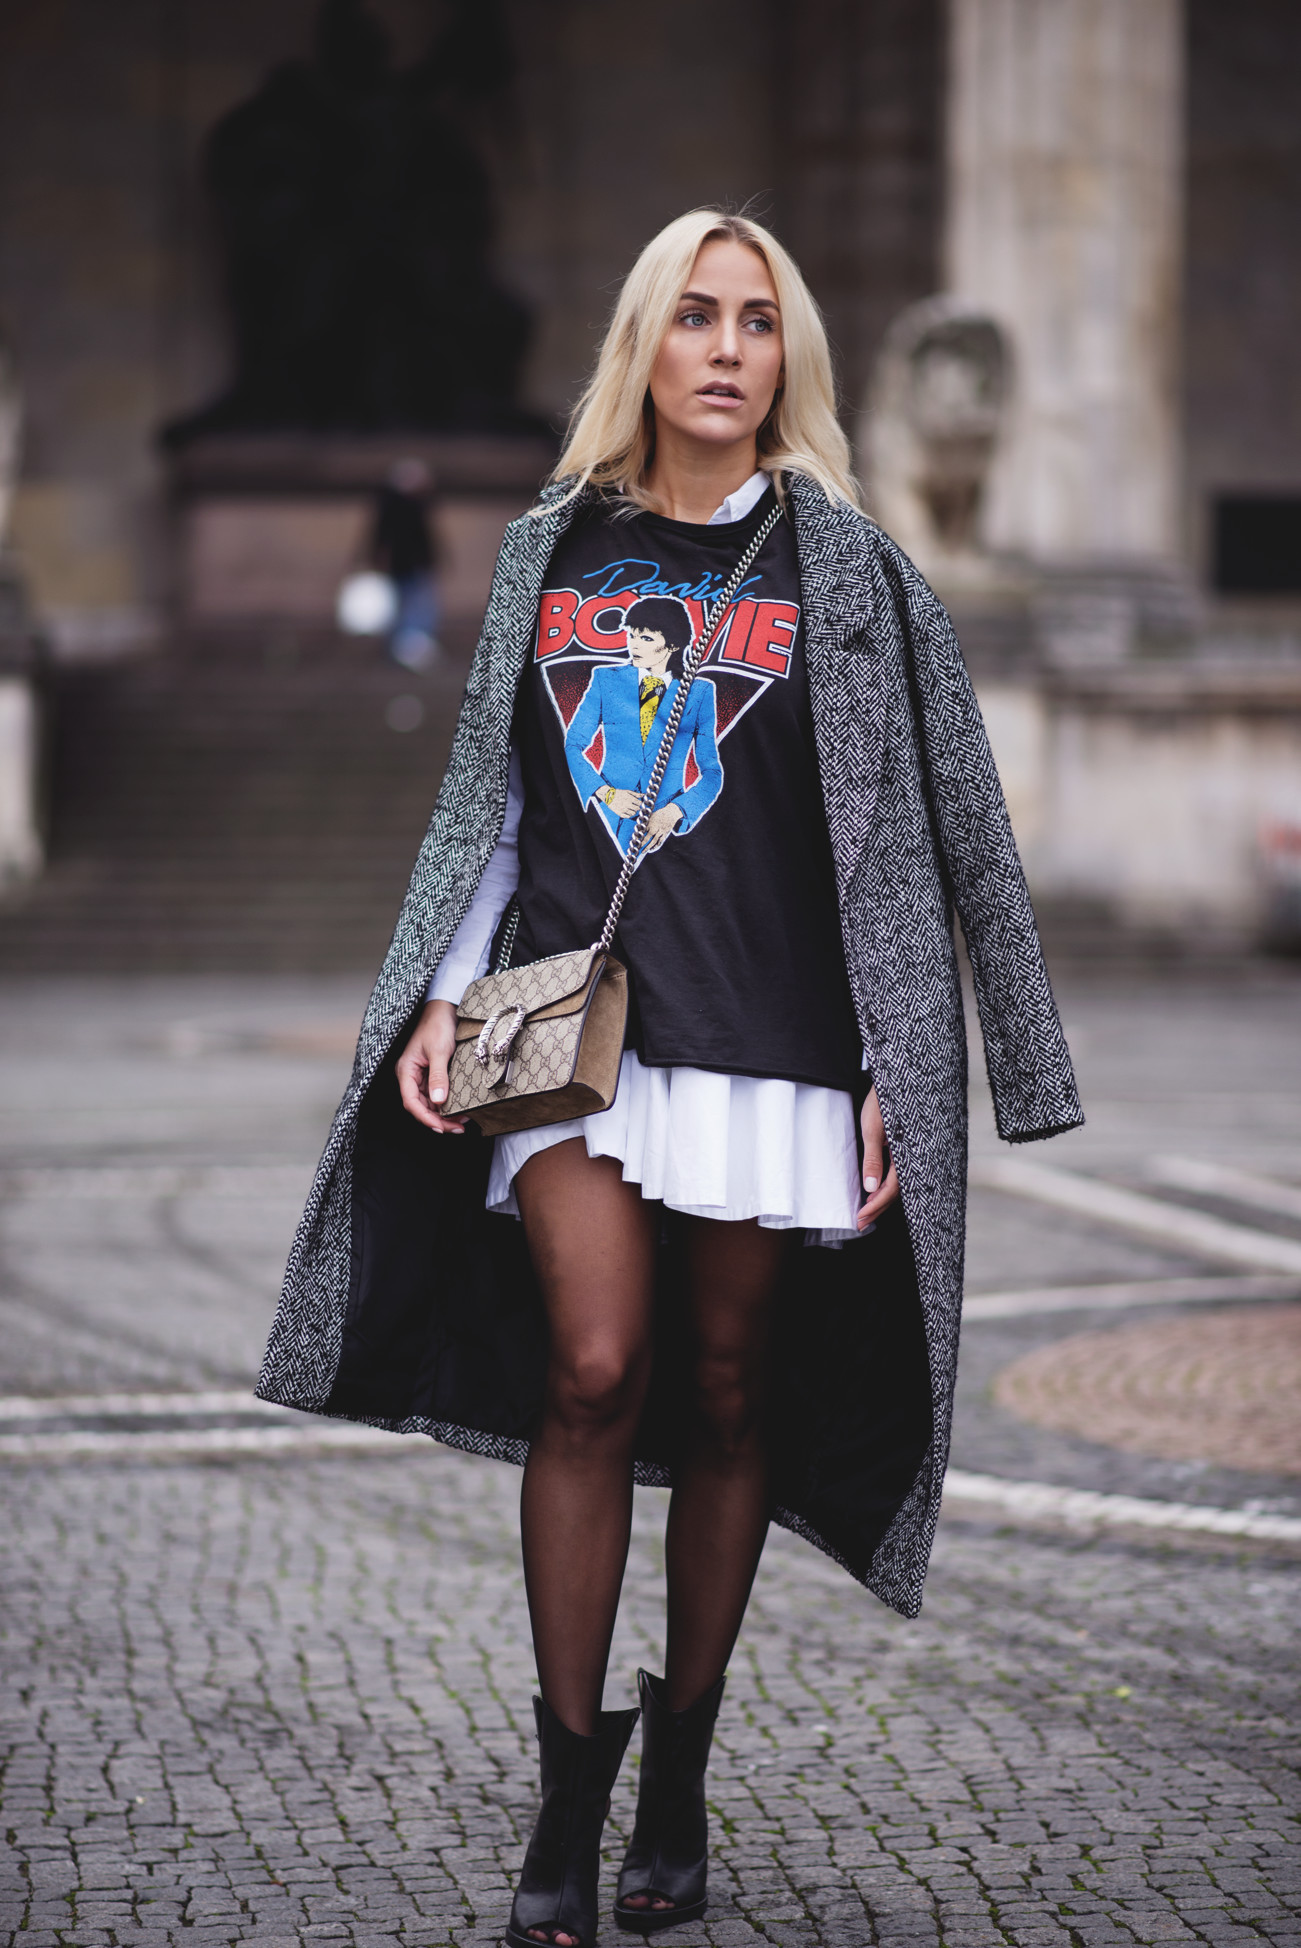 davidbowie-bandshirt-guccidionysus-fashion-fashionblogger-munich-sequinsophia-1-dsc_3660